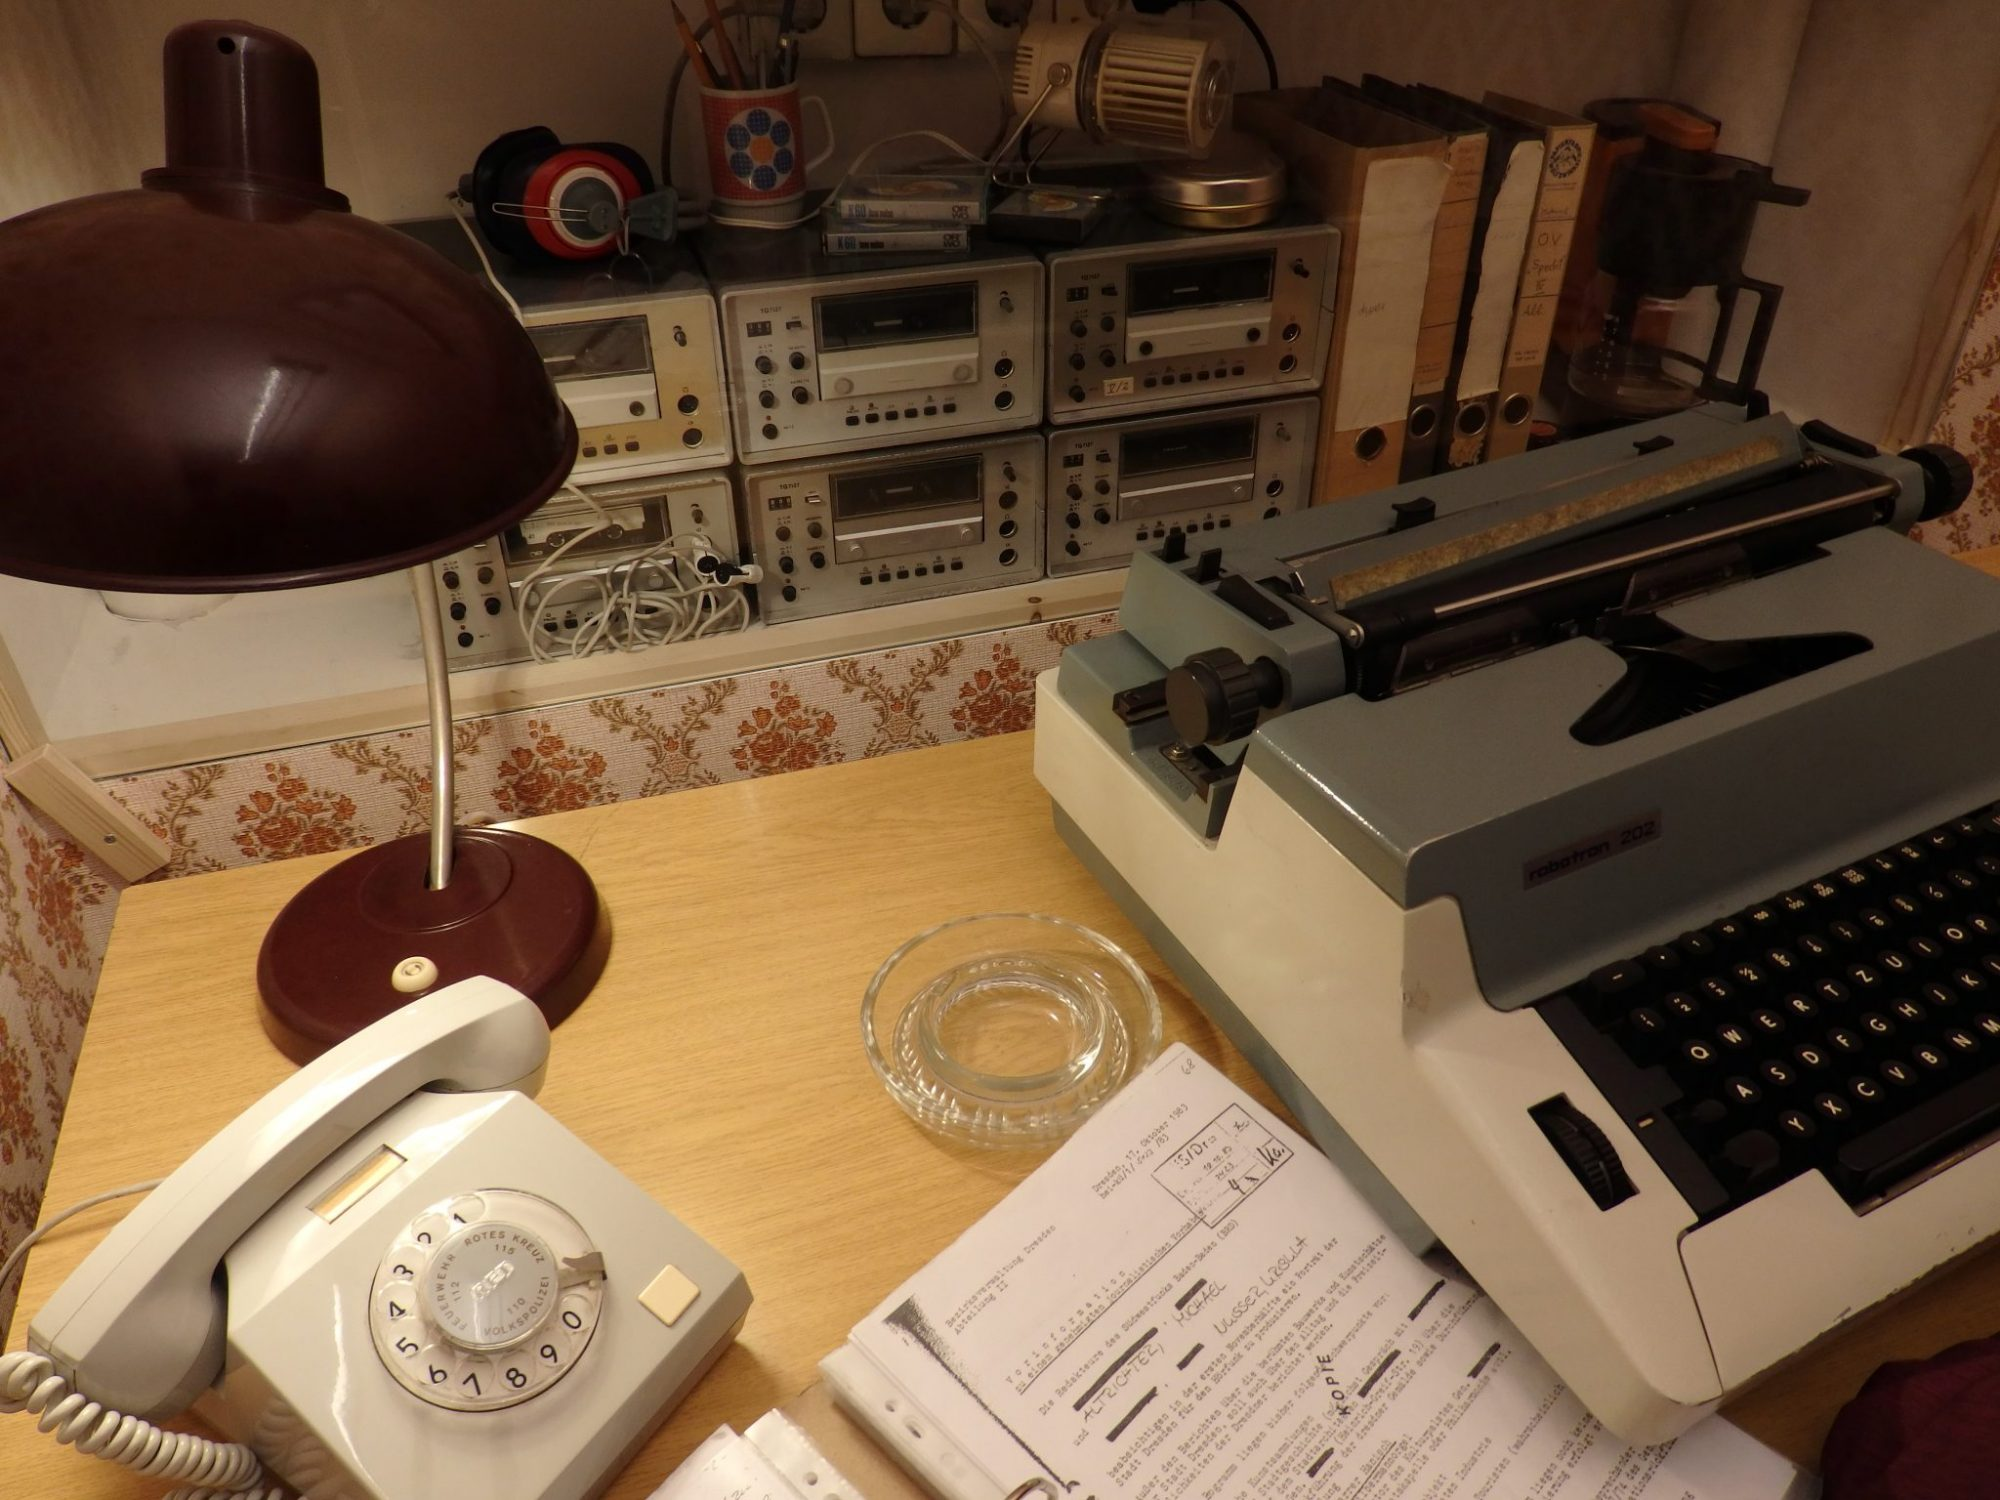 surveillance equipment in the DDR Museum in Berlin